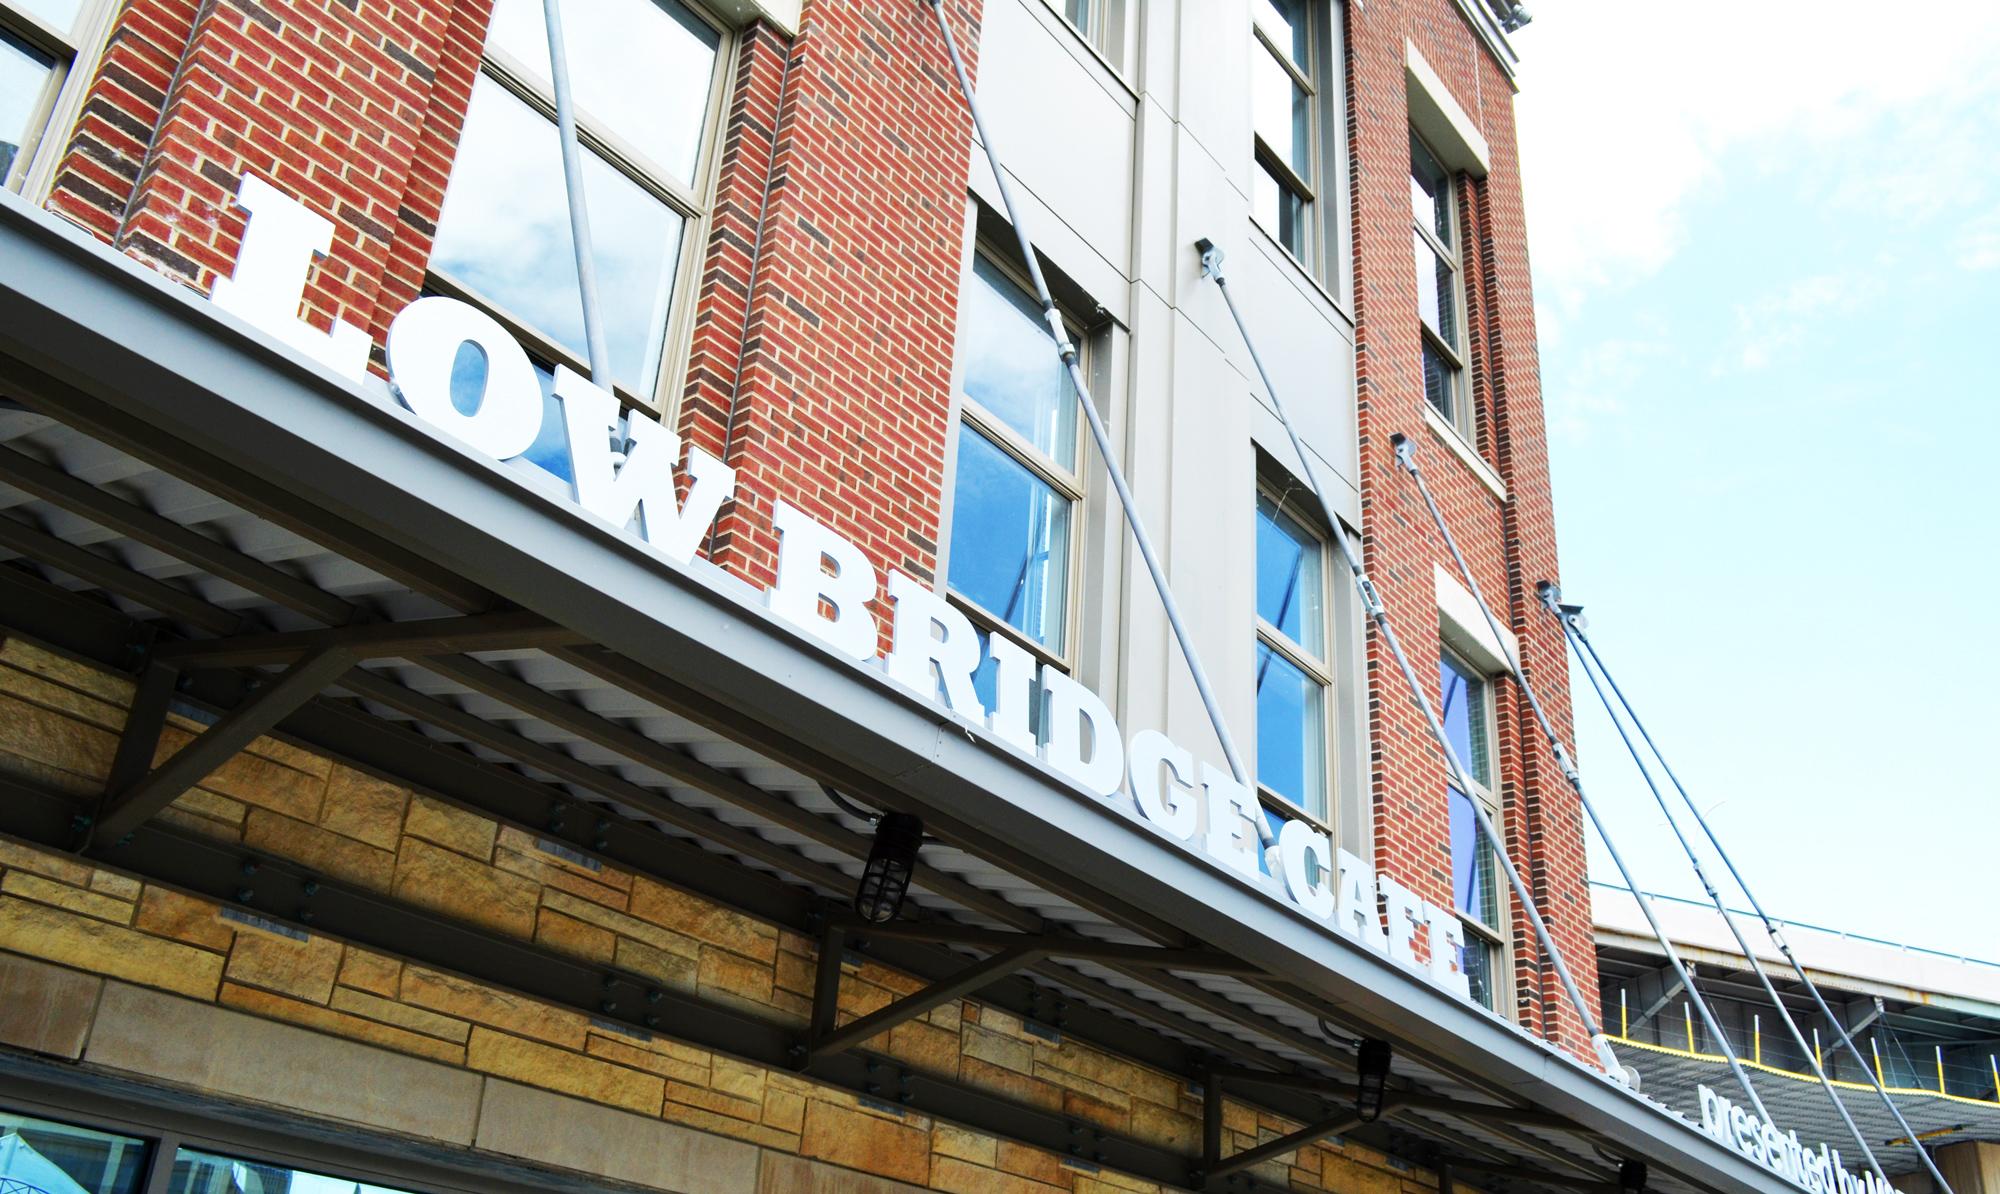 Lowbridge Cafe awning letters